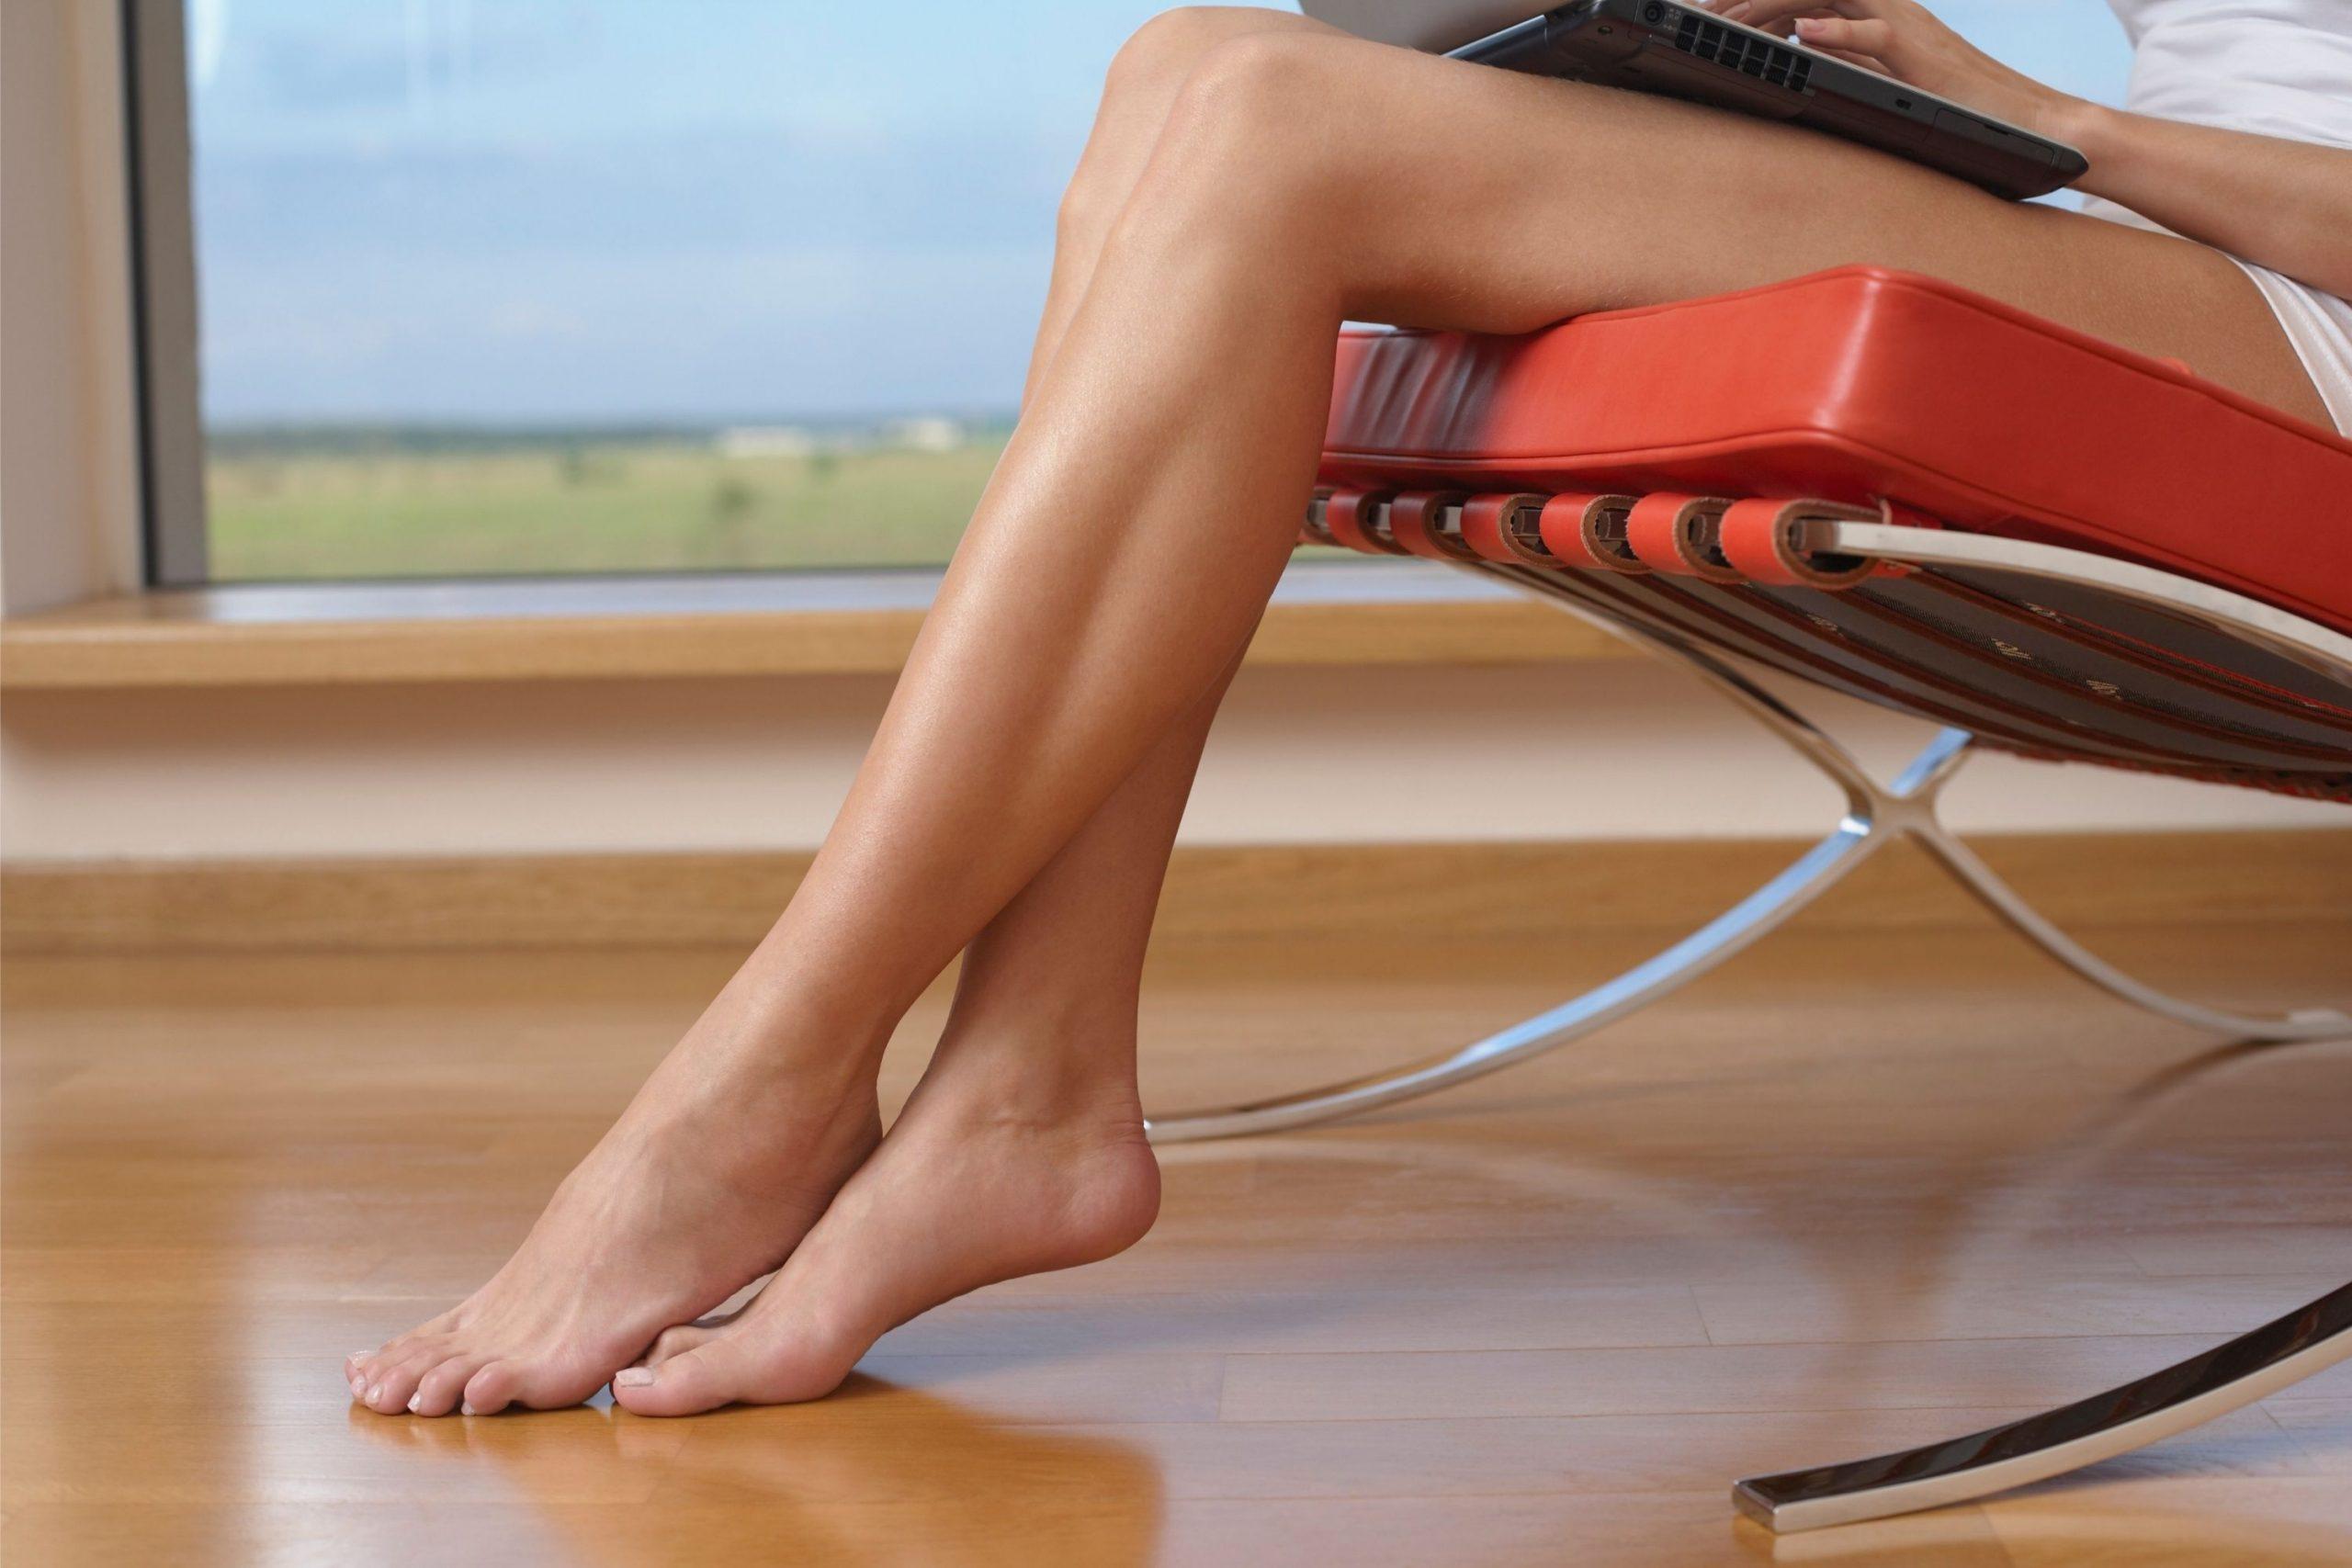 Can Heat Make Our Leg Hair Grow Faster